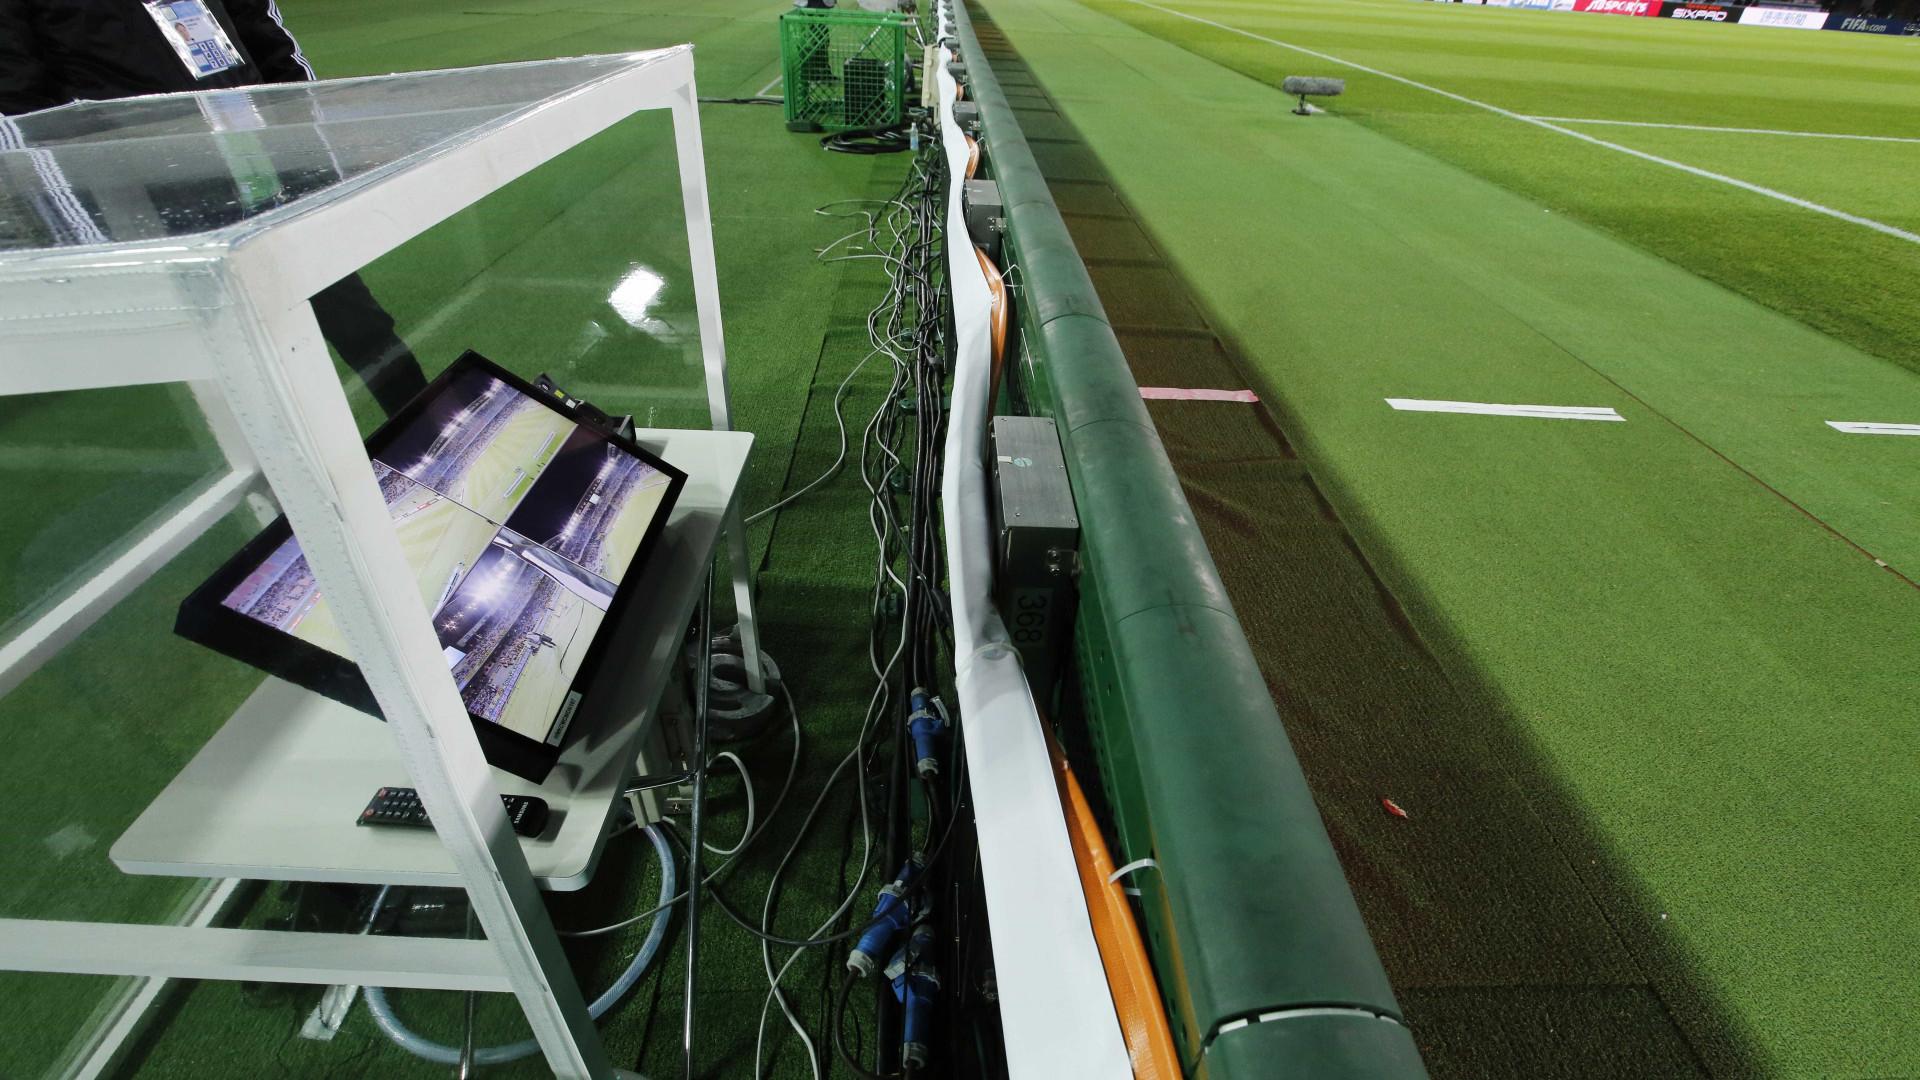 Jogo entre Marítimo e Santa Clara sem vídeoárbitro